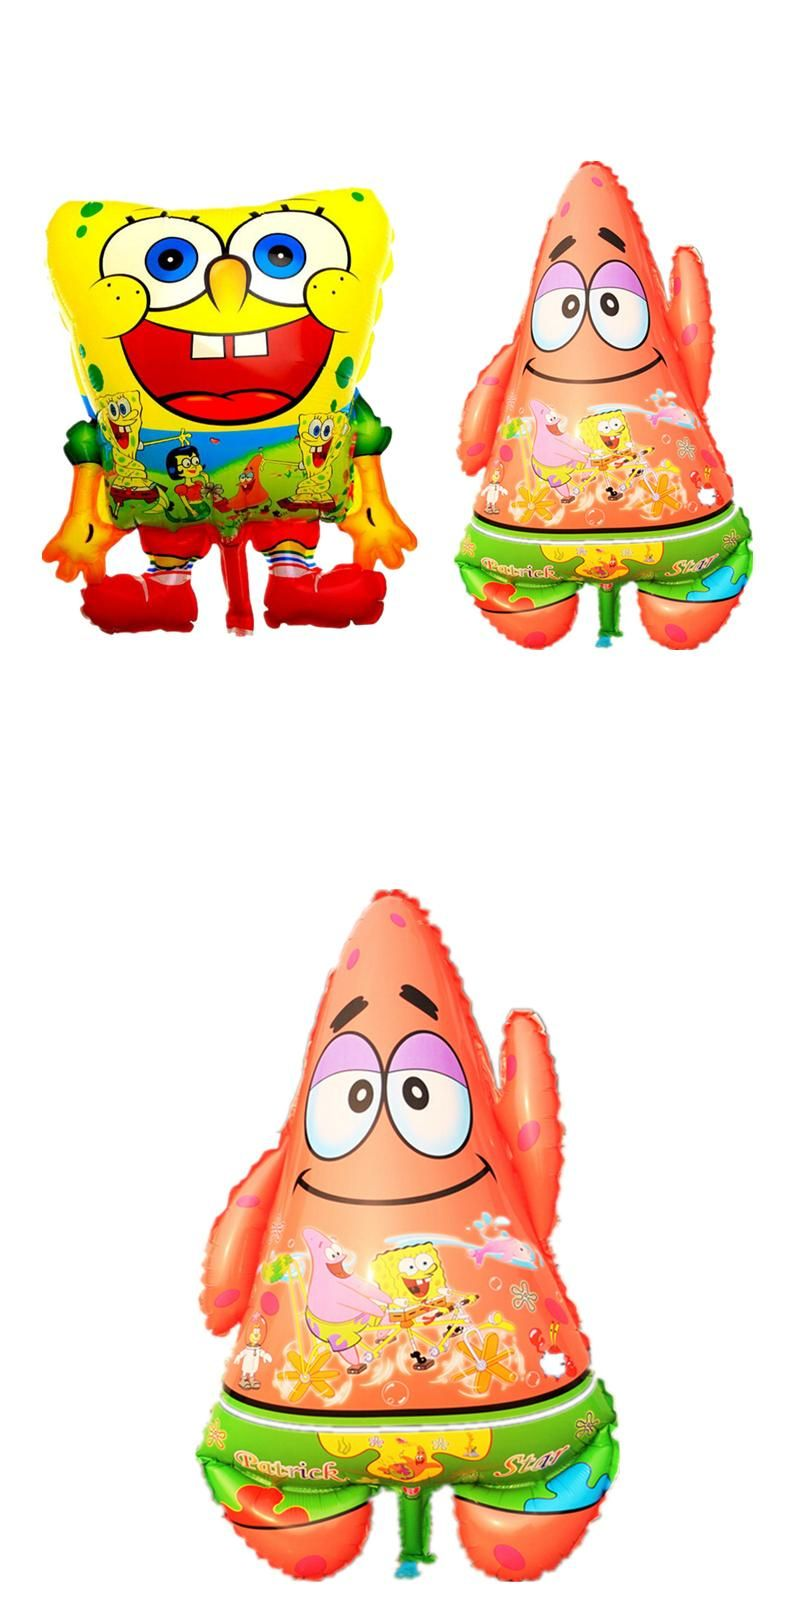 Visit to Buy] 1pcs Cute Cartoon Animal Shape Spongebob Patrick Star ...